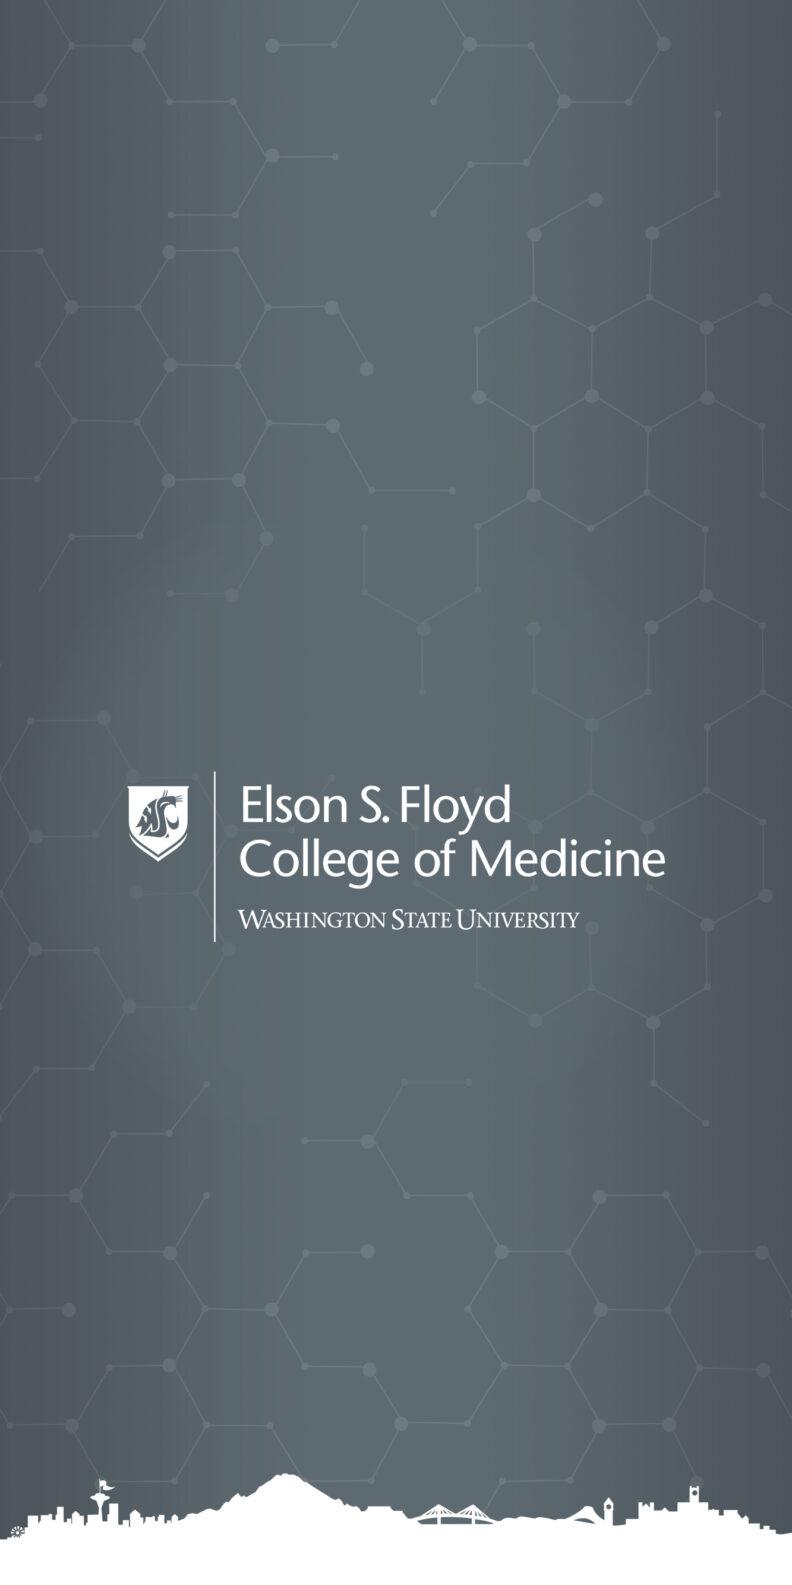 Vertical Gray Wallpaper Mobile WSU College of Medicine logo